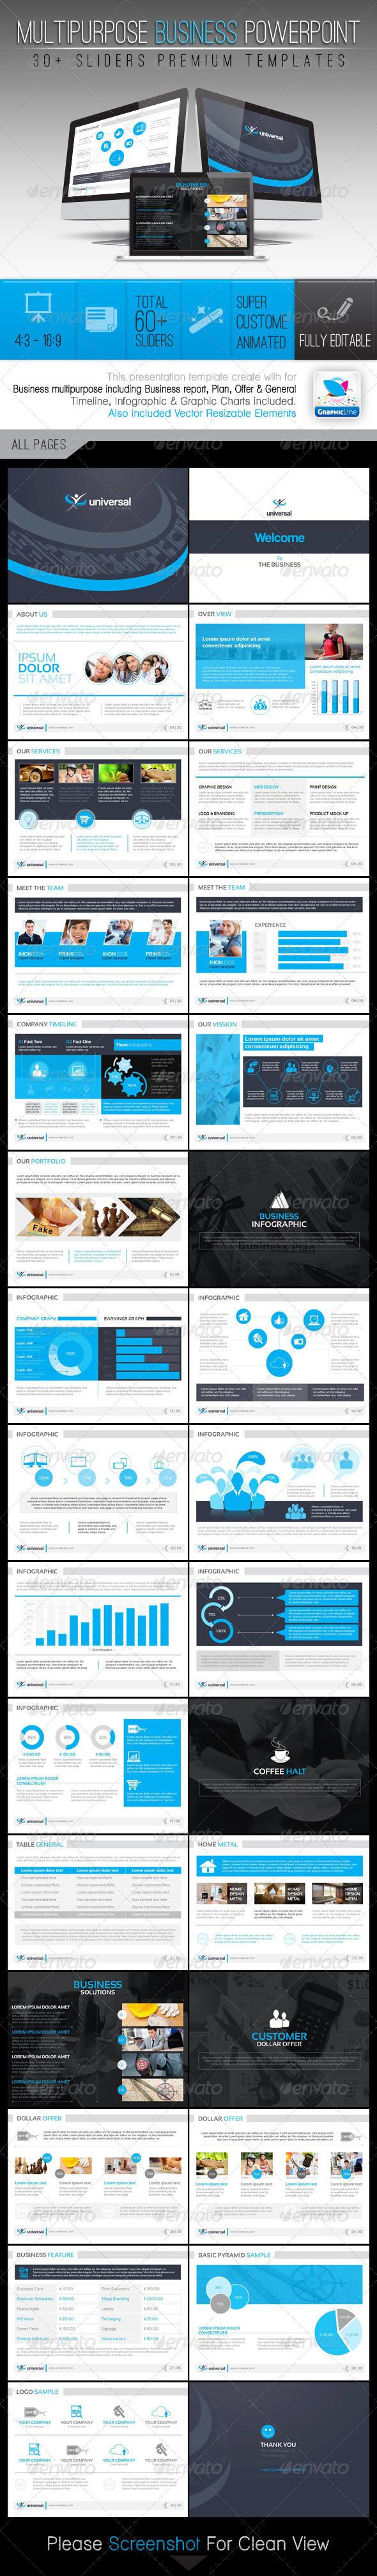 GraphicRiver Universal Multipurpose Business Templates 7827392